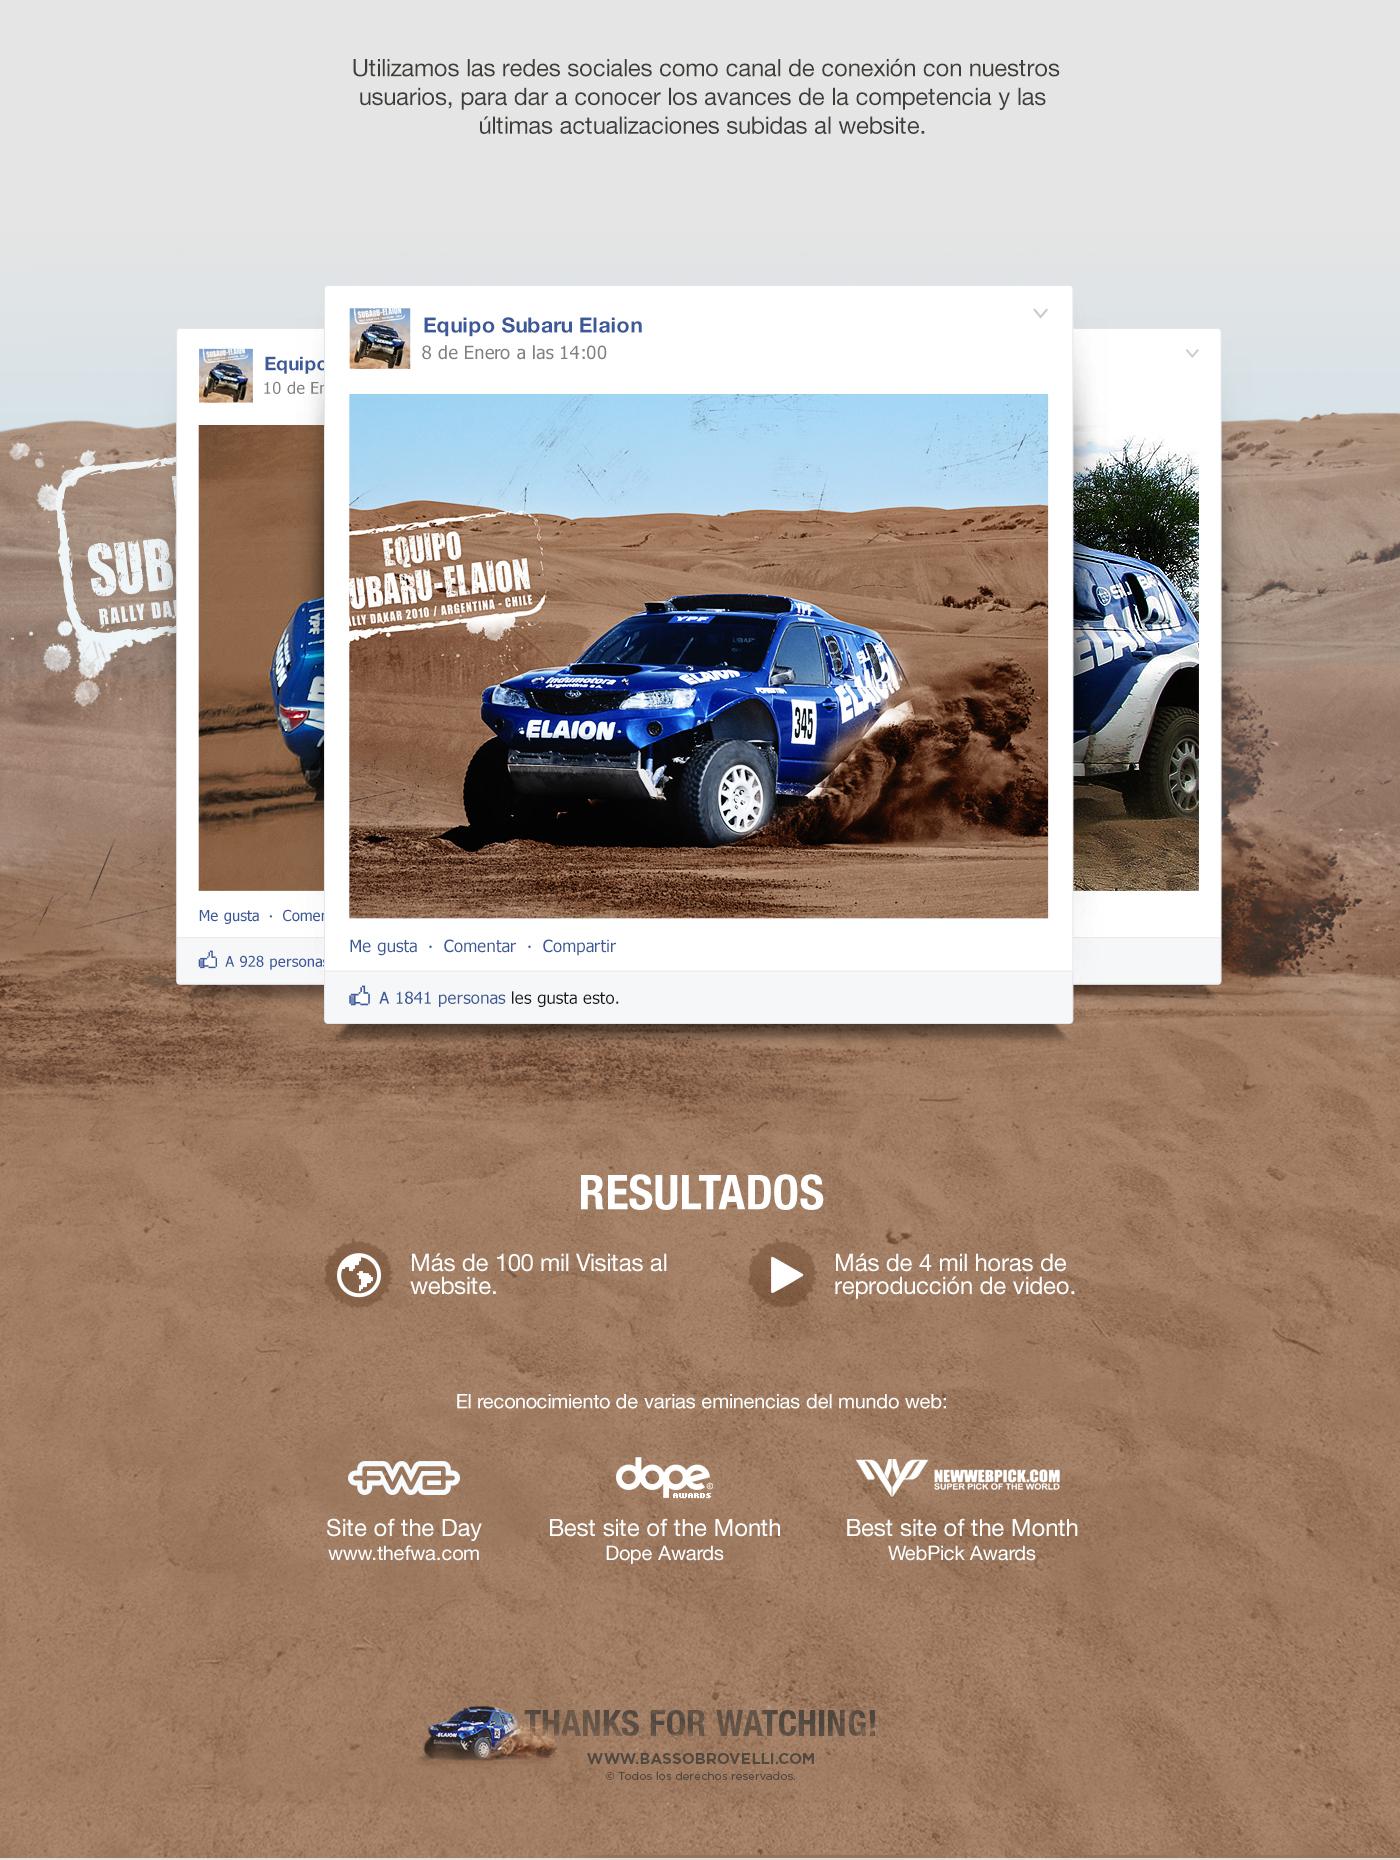 web site Subaru - Elaion Web dakar rally video race YPF FWA social media